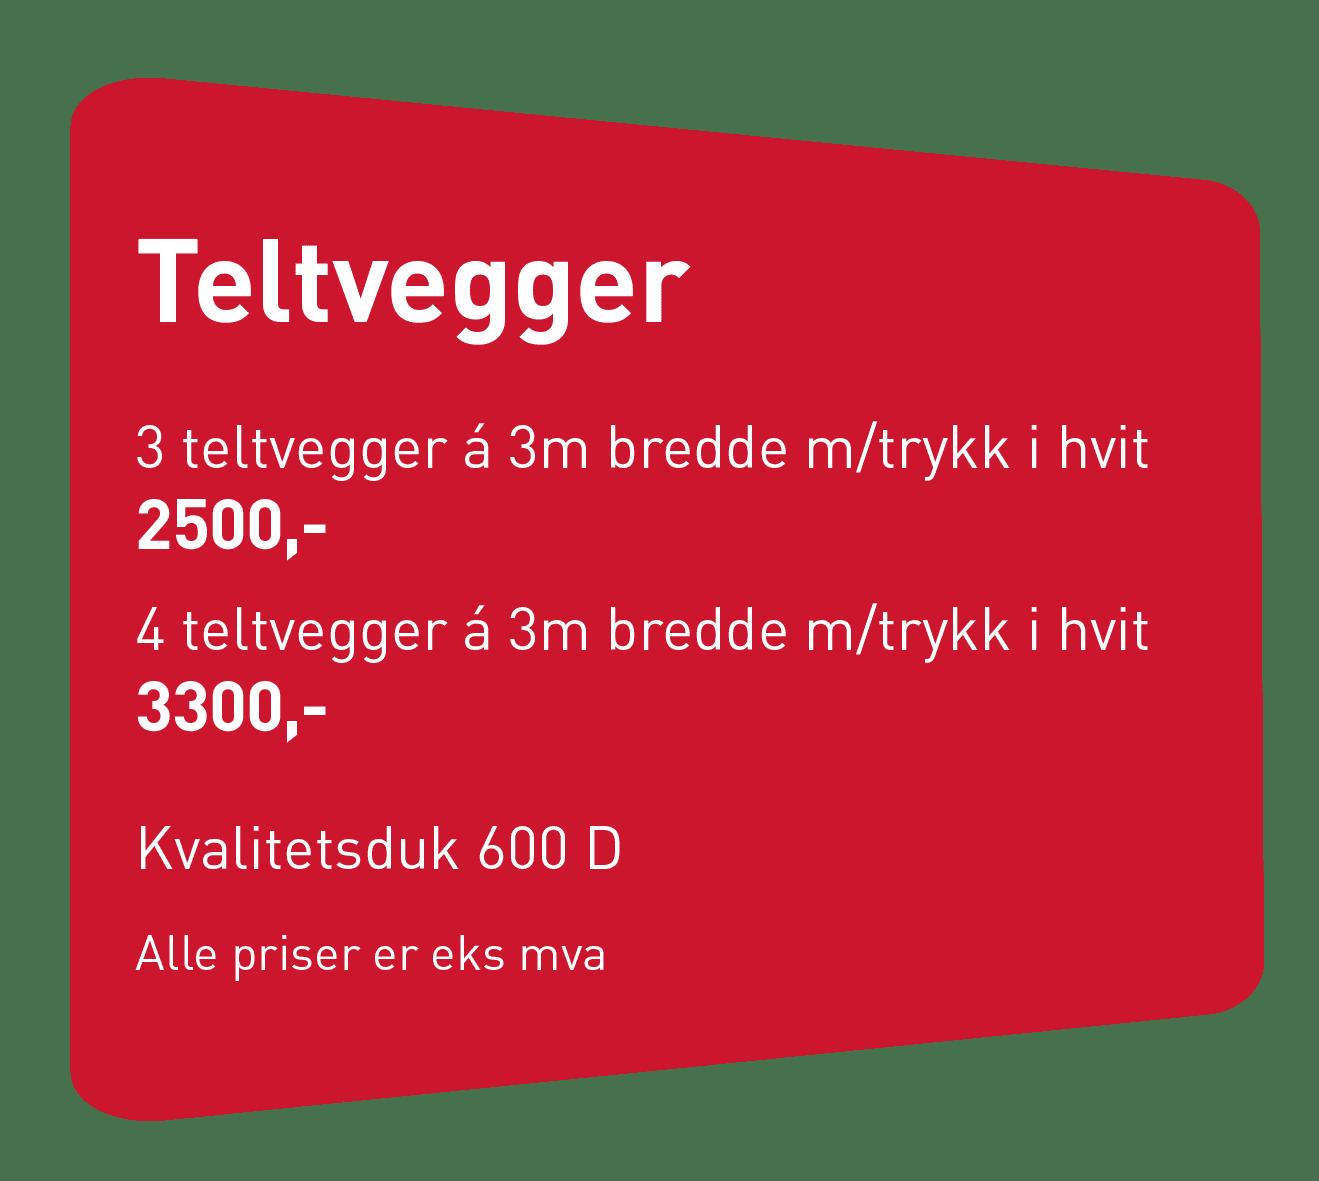 Teltvegger, pris - Allprofil AS - Trykksaker - Profilering - Klær - Digital skilting - Tjenester - Kontakt